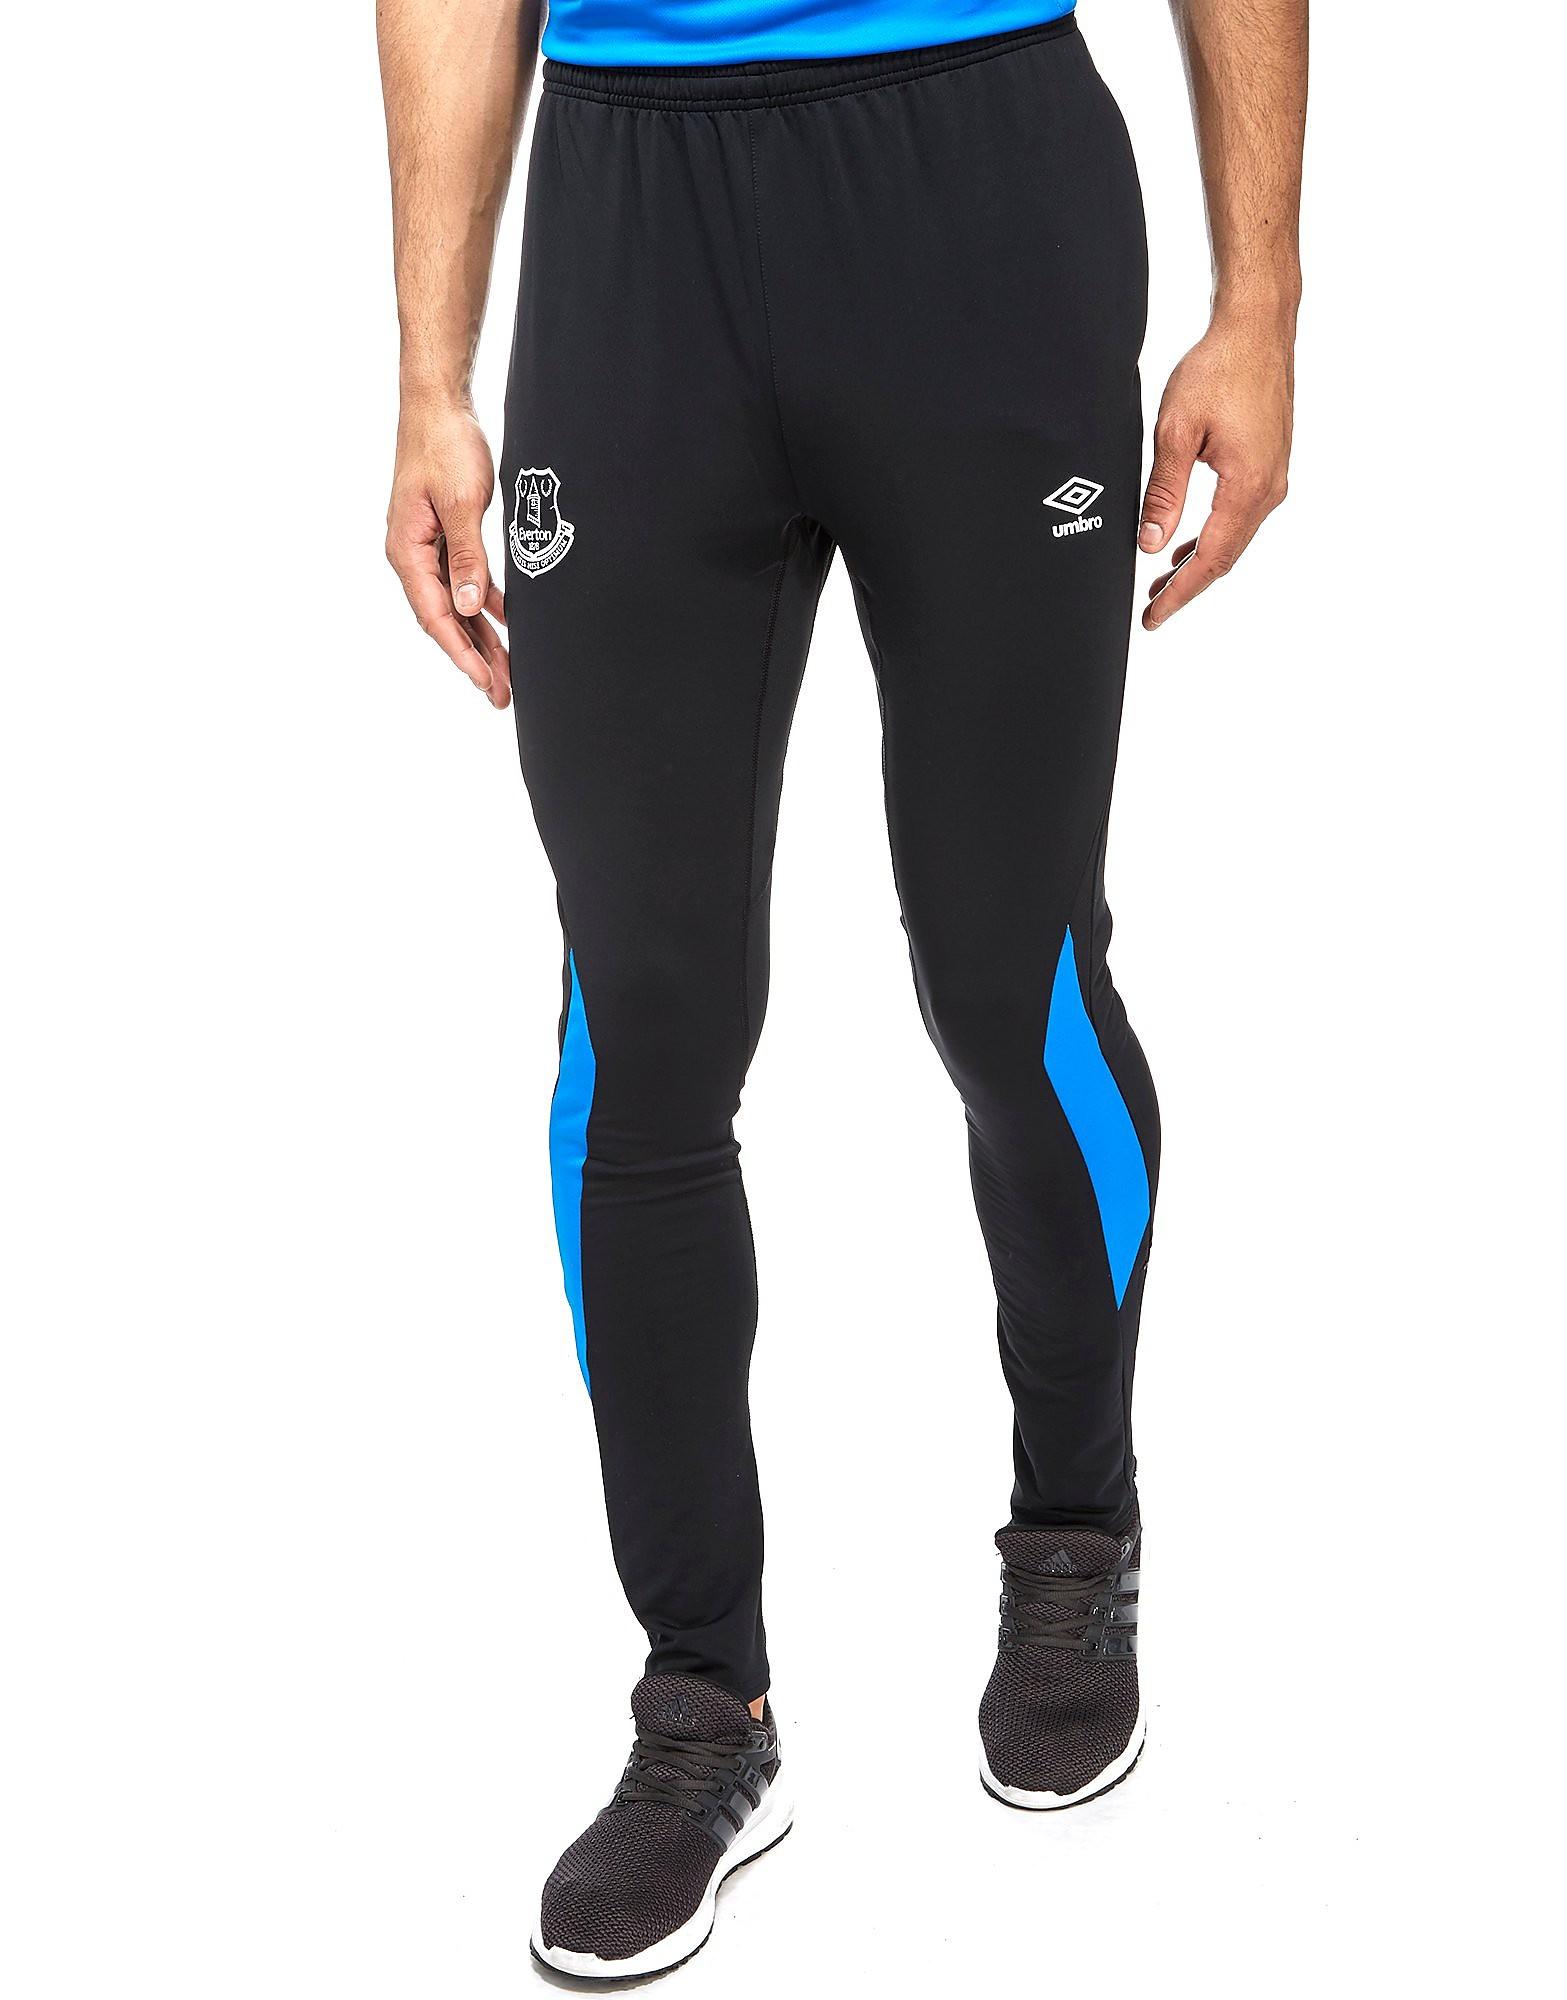 Umbro Everton FC Training Pants